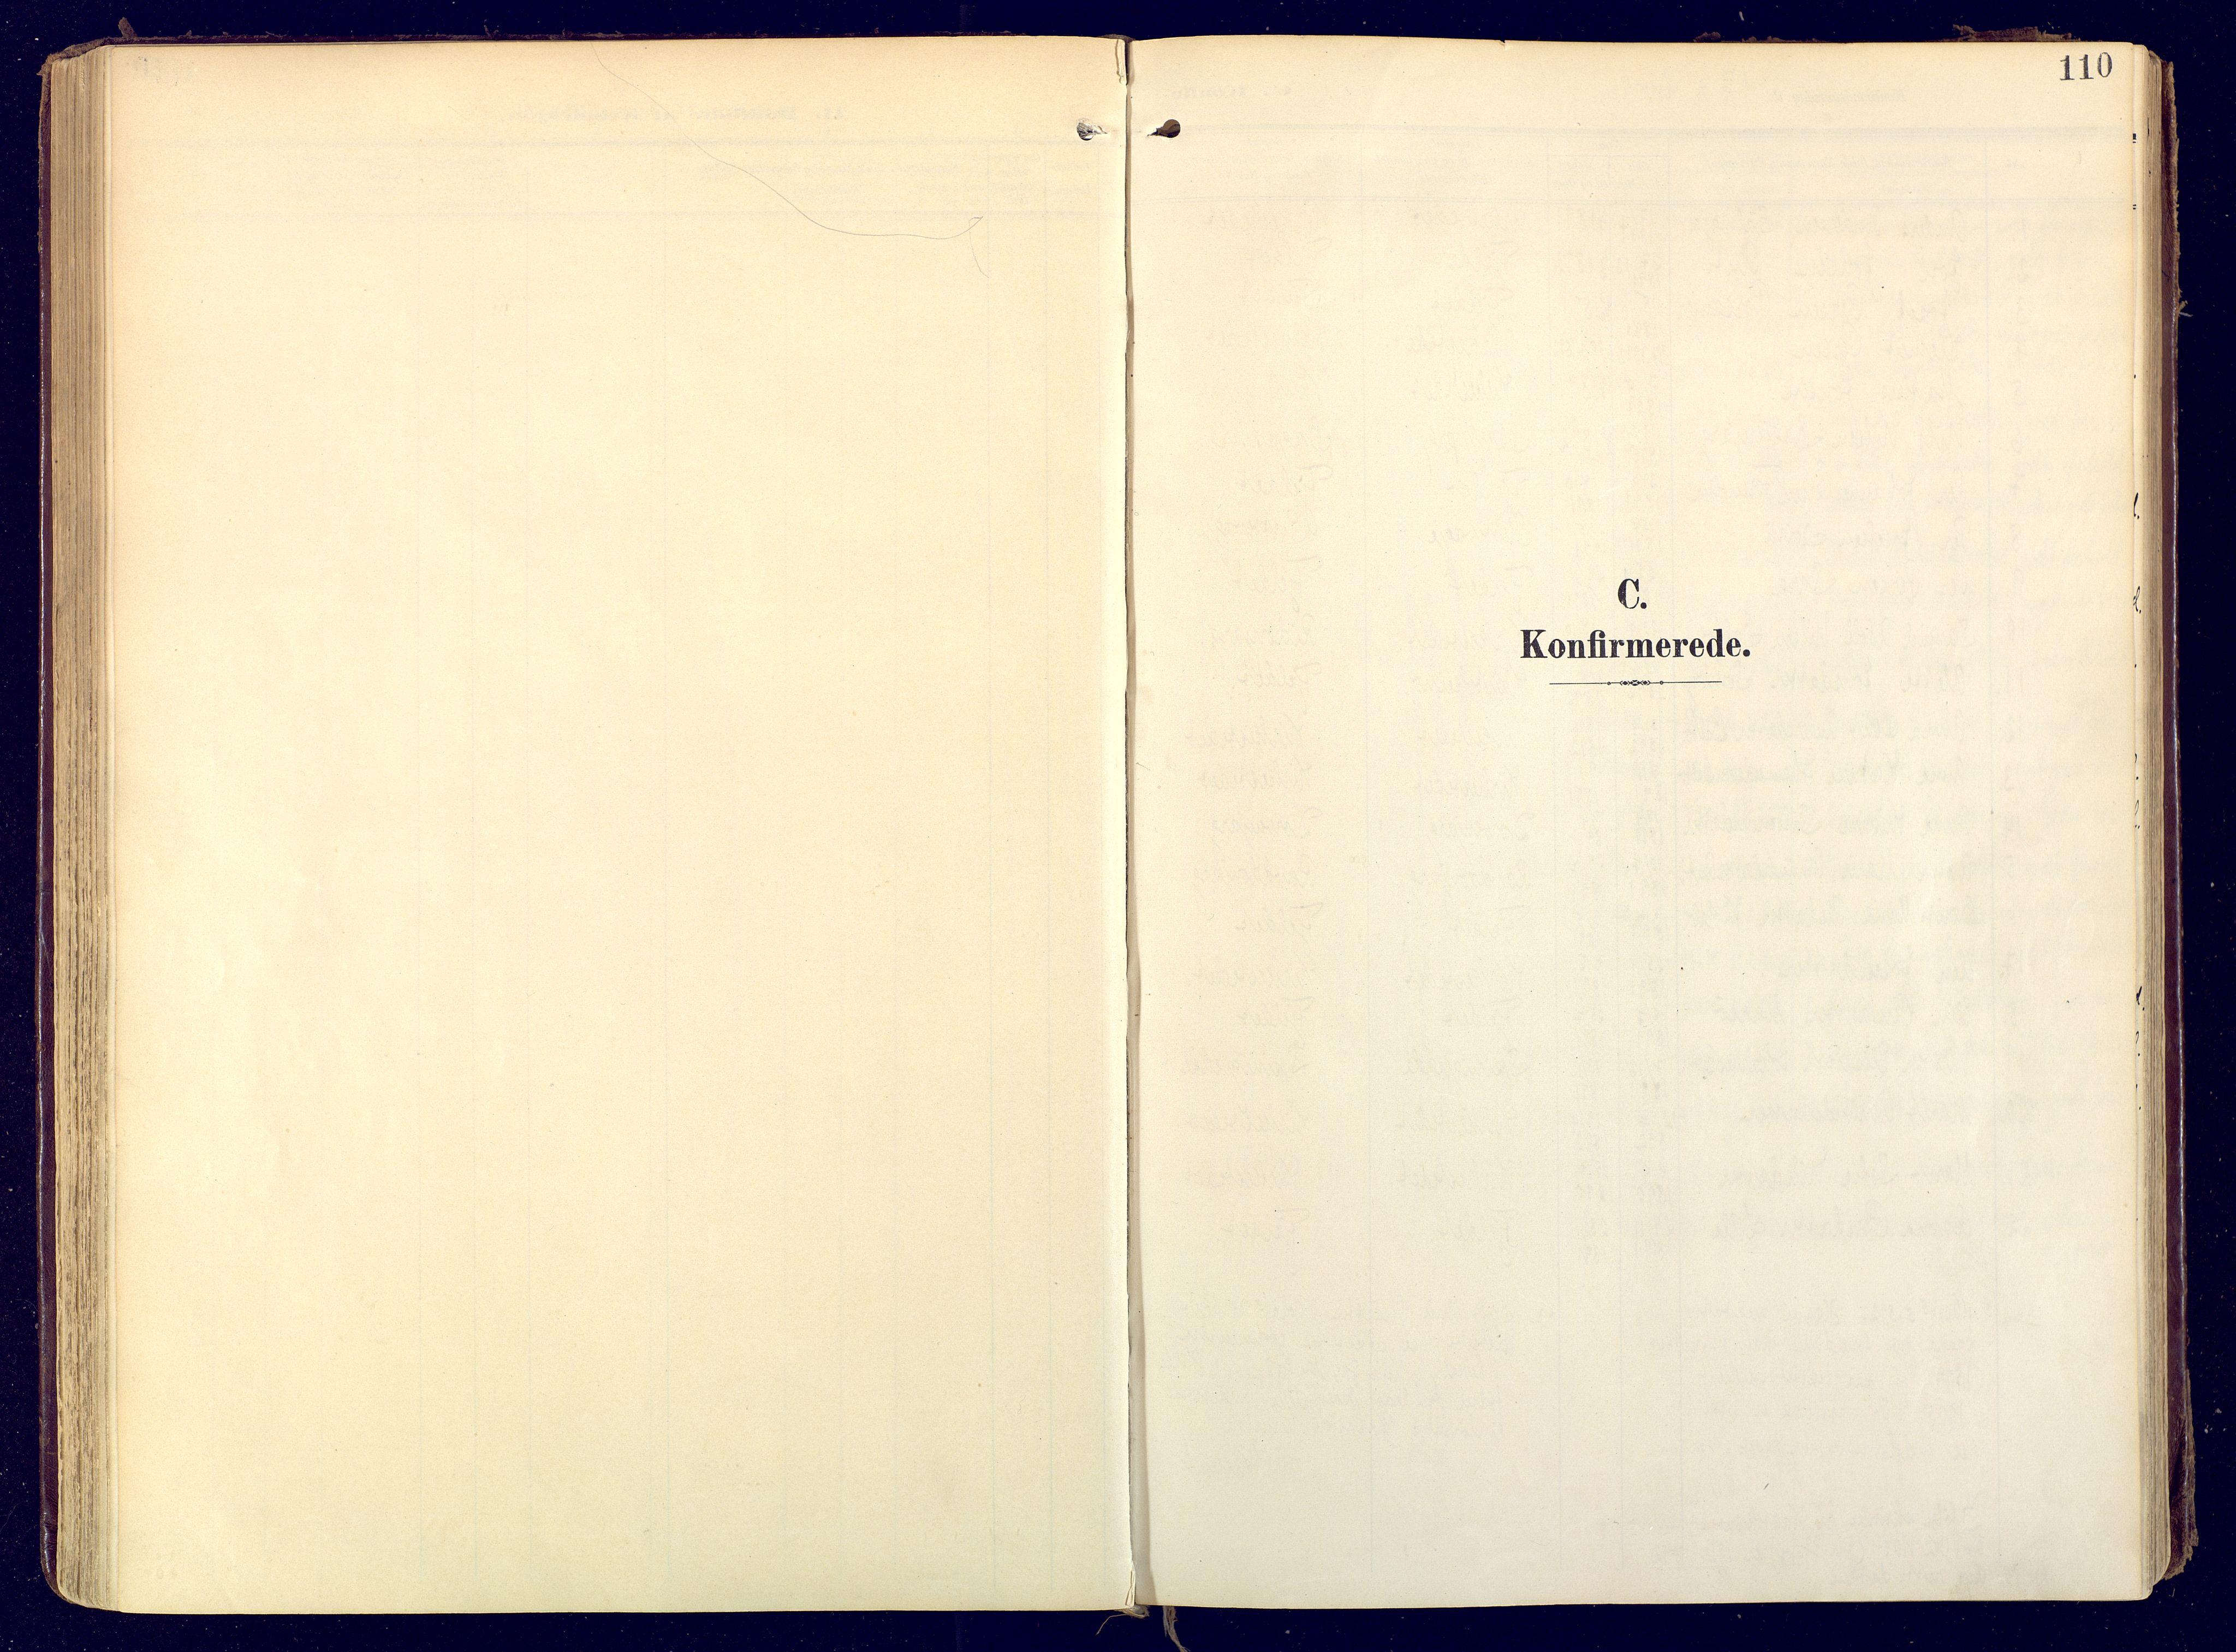 SATØ, Karasjok sokneprestkontor, H/Ha: Ministerialbok nr. 3, 1907-1926, s. 110